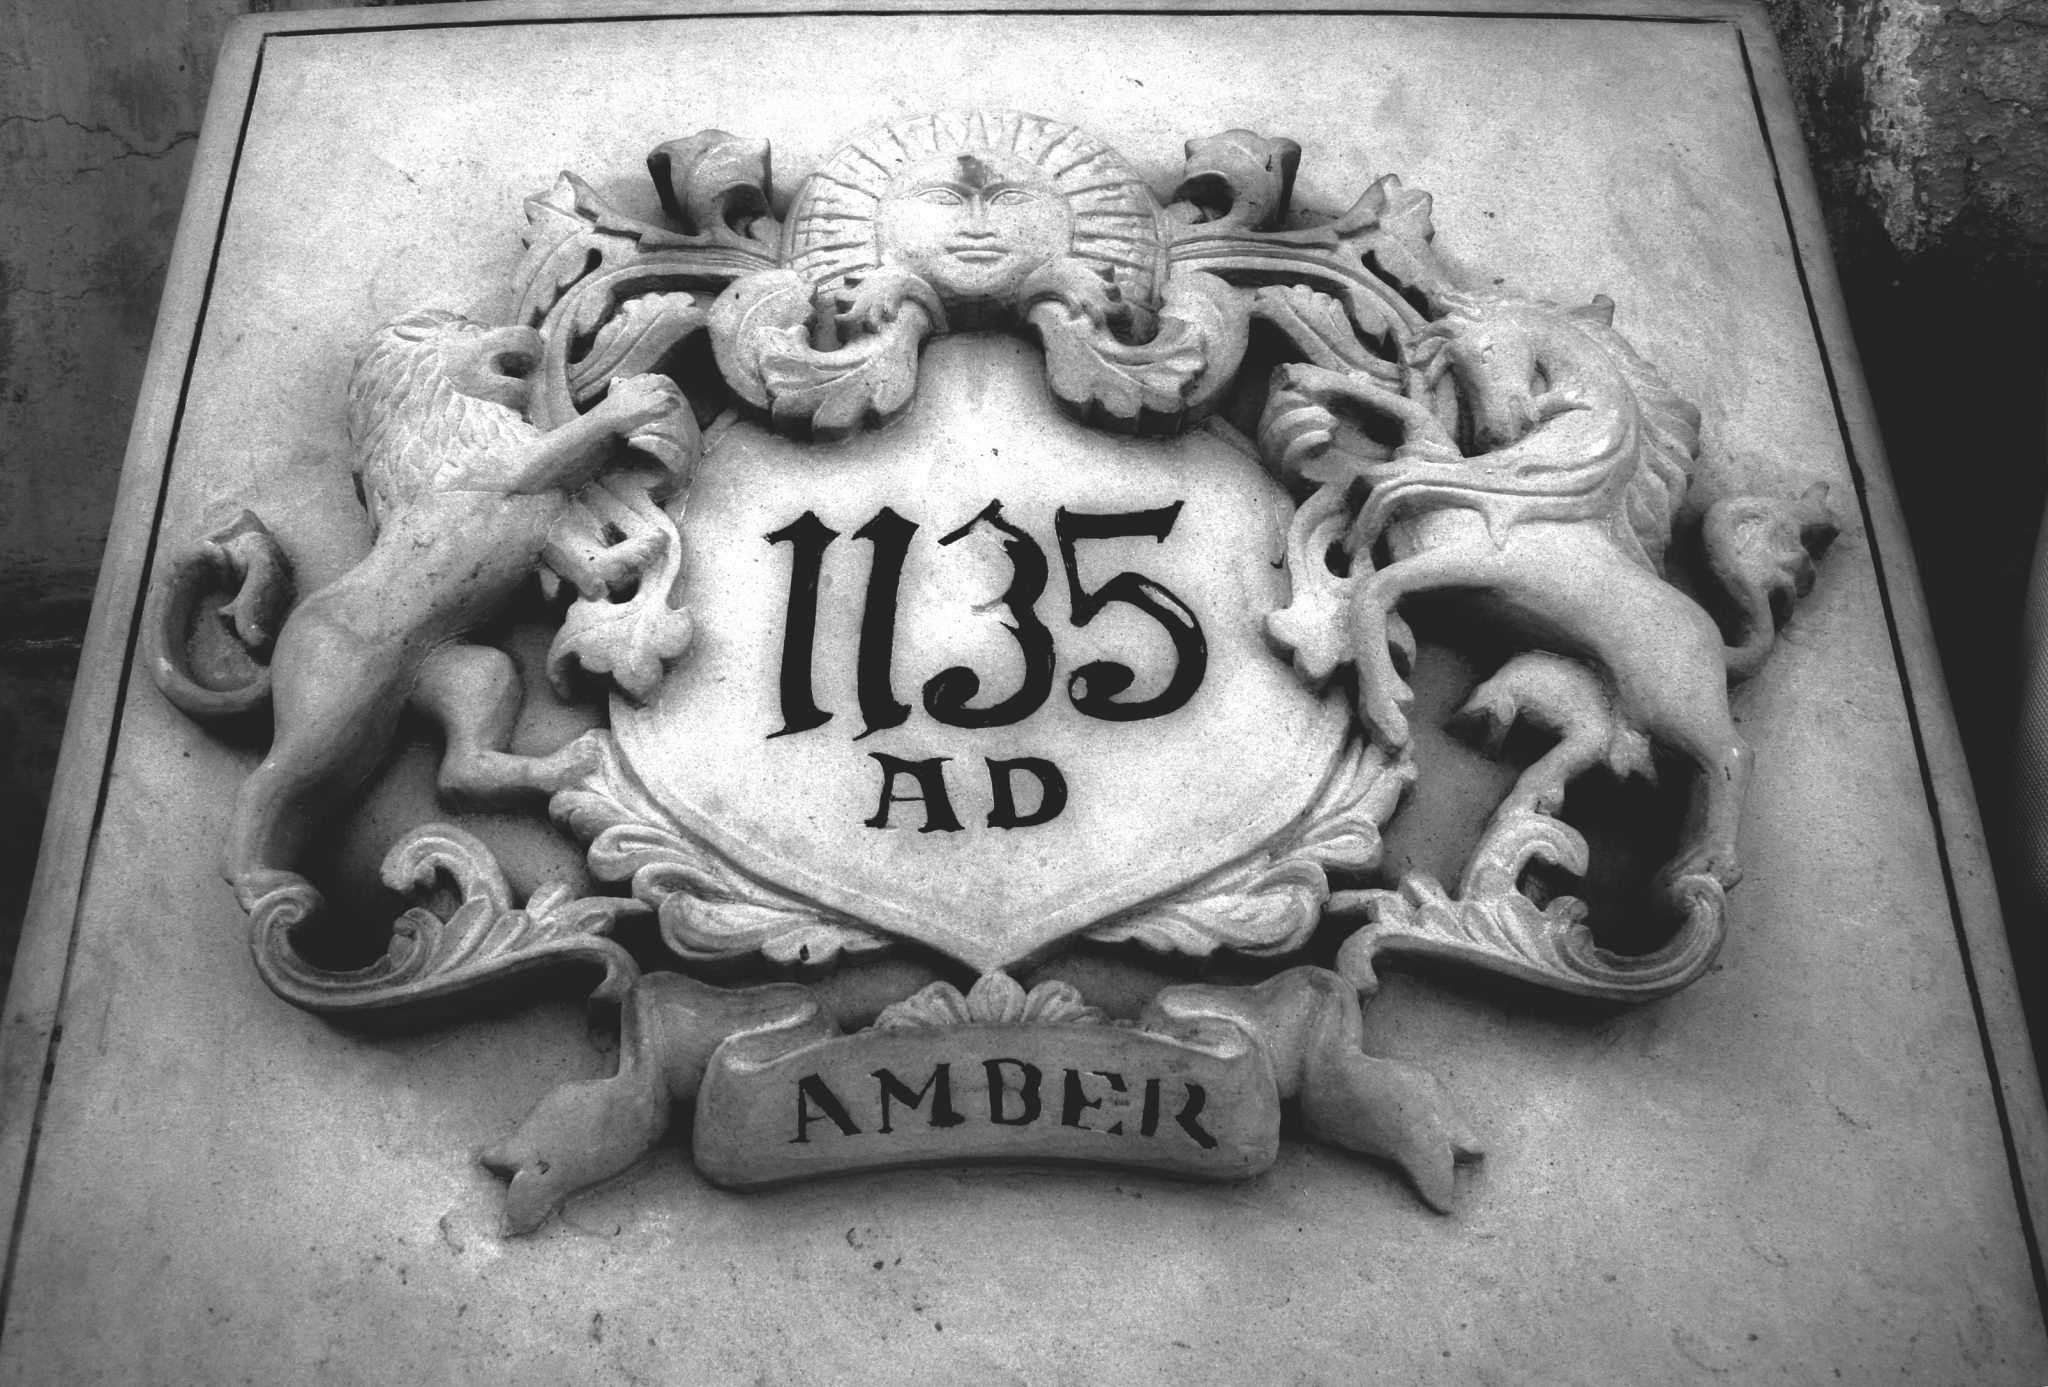 1135 AD